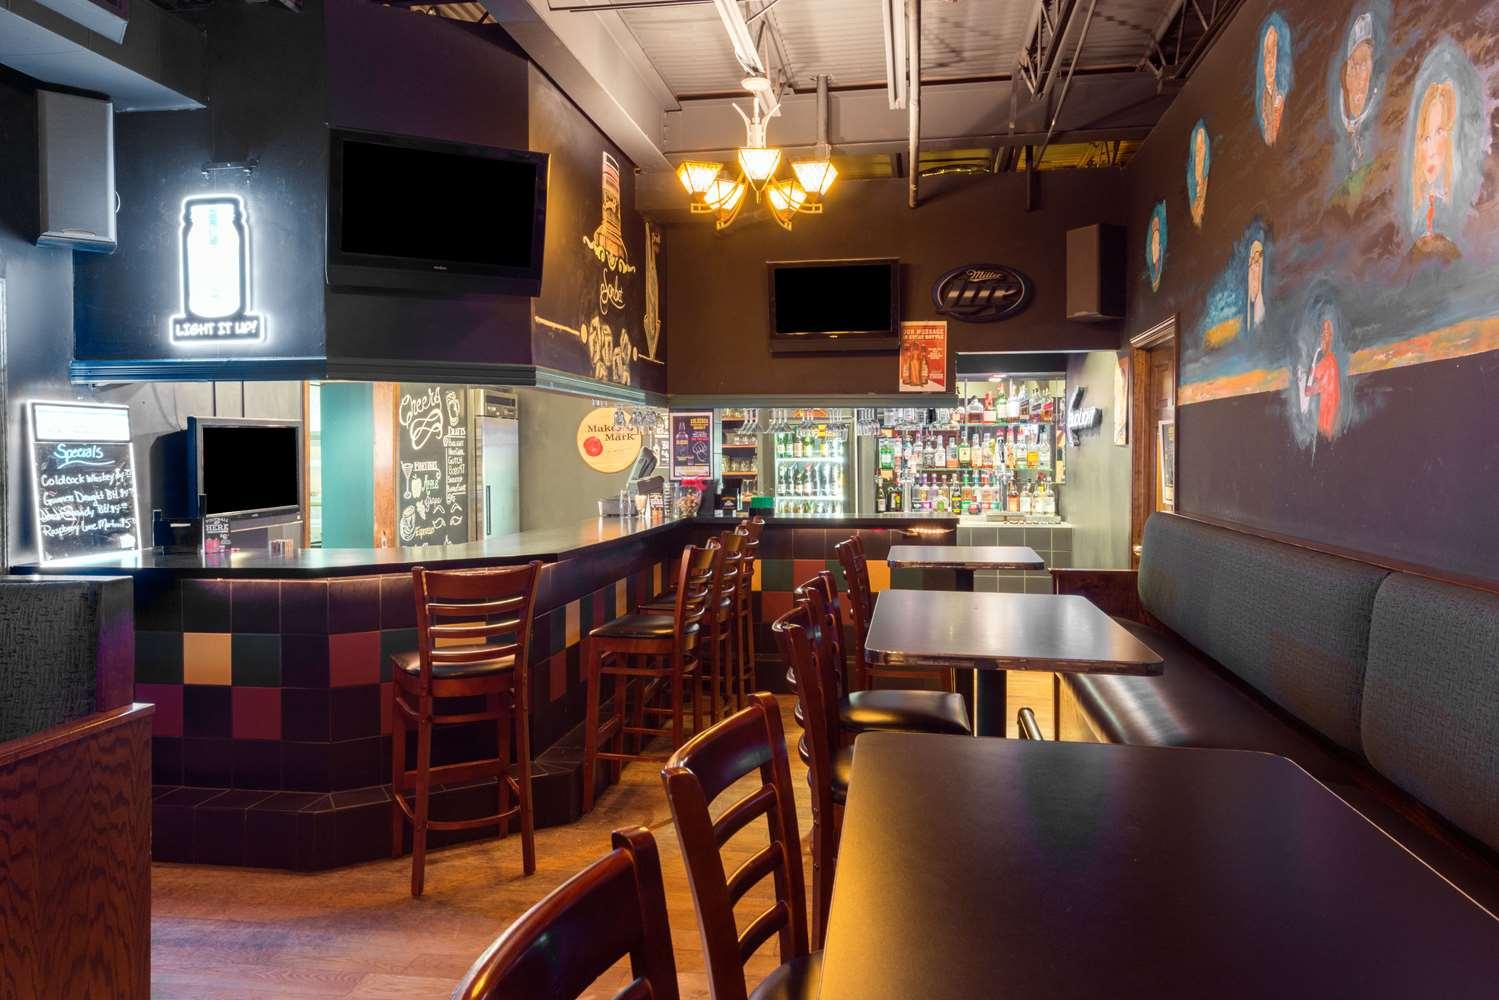 Bar - Ramada Inn Convention Center Downtown Topeka